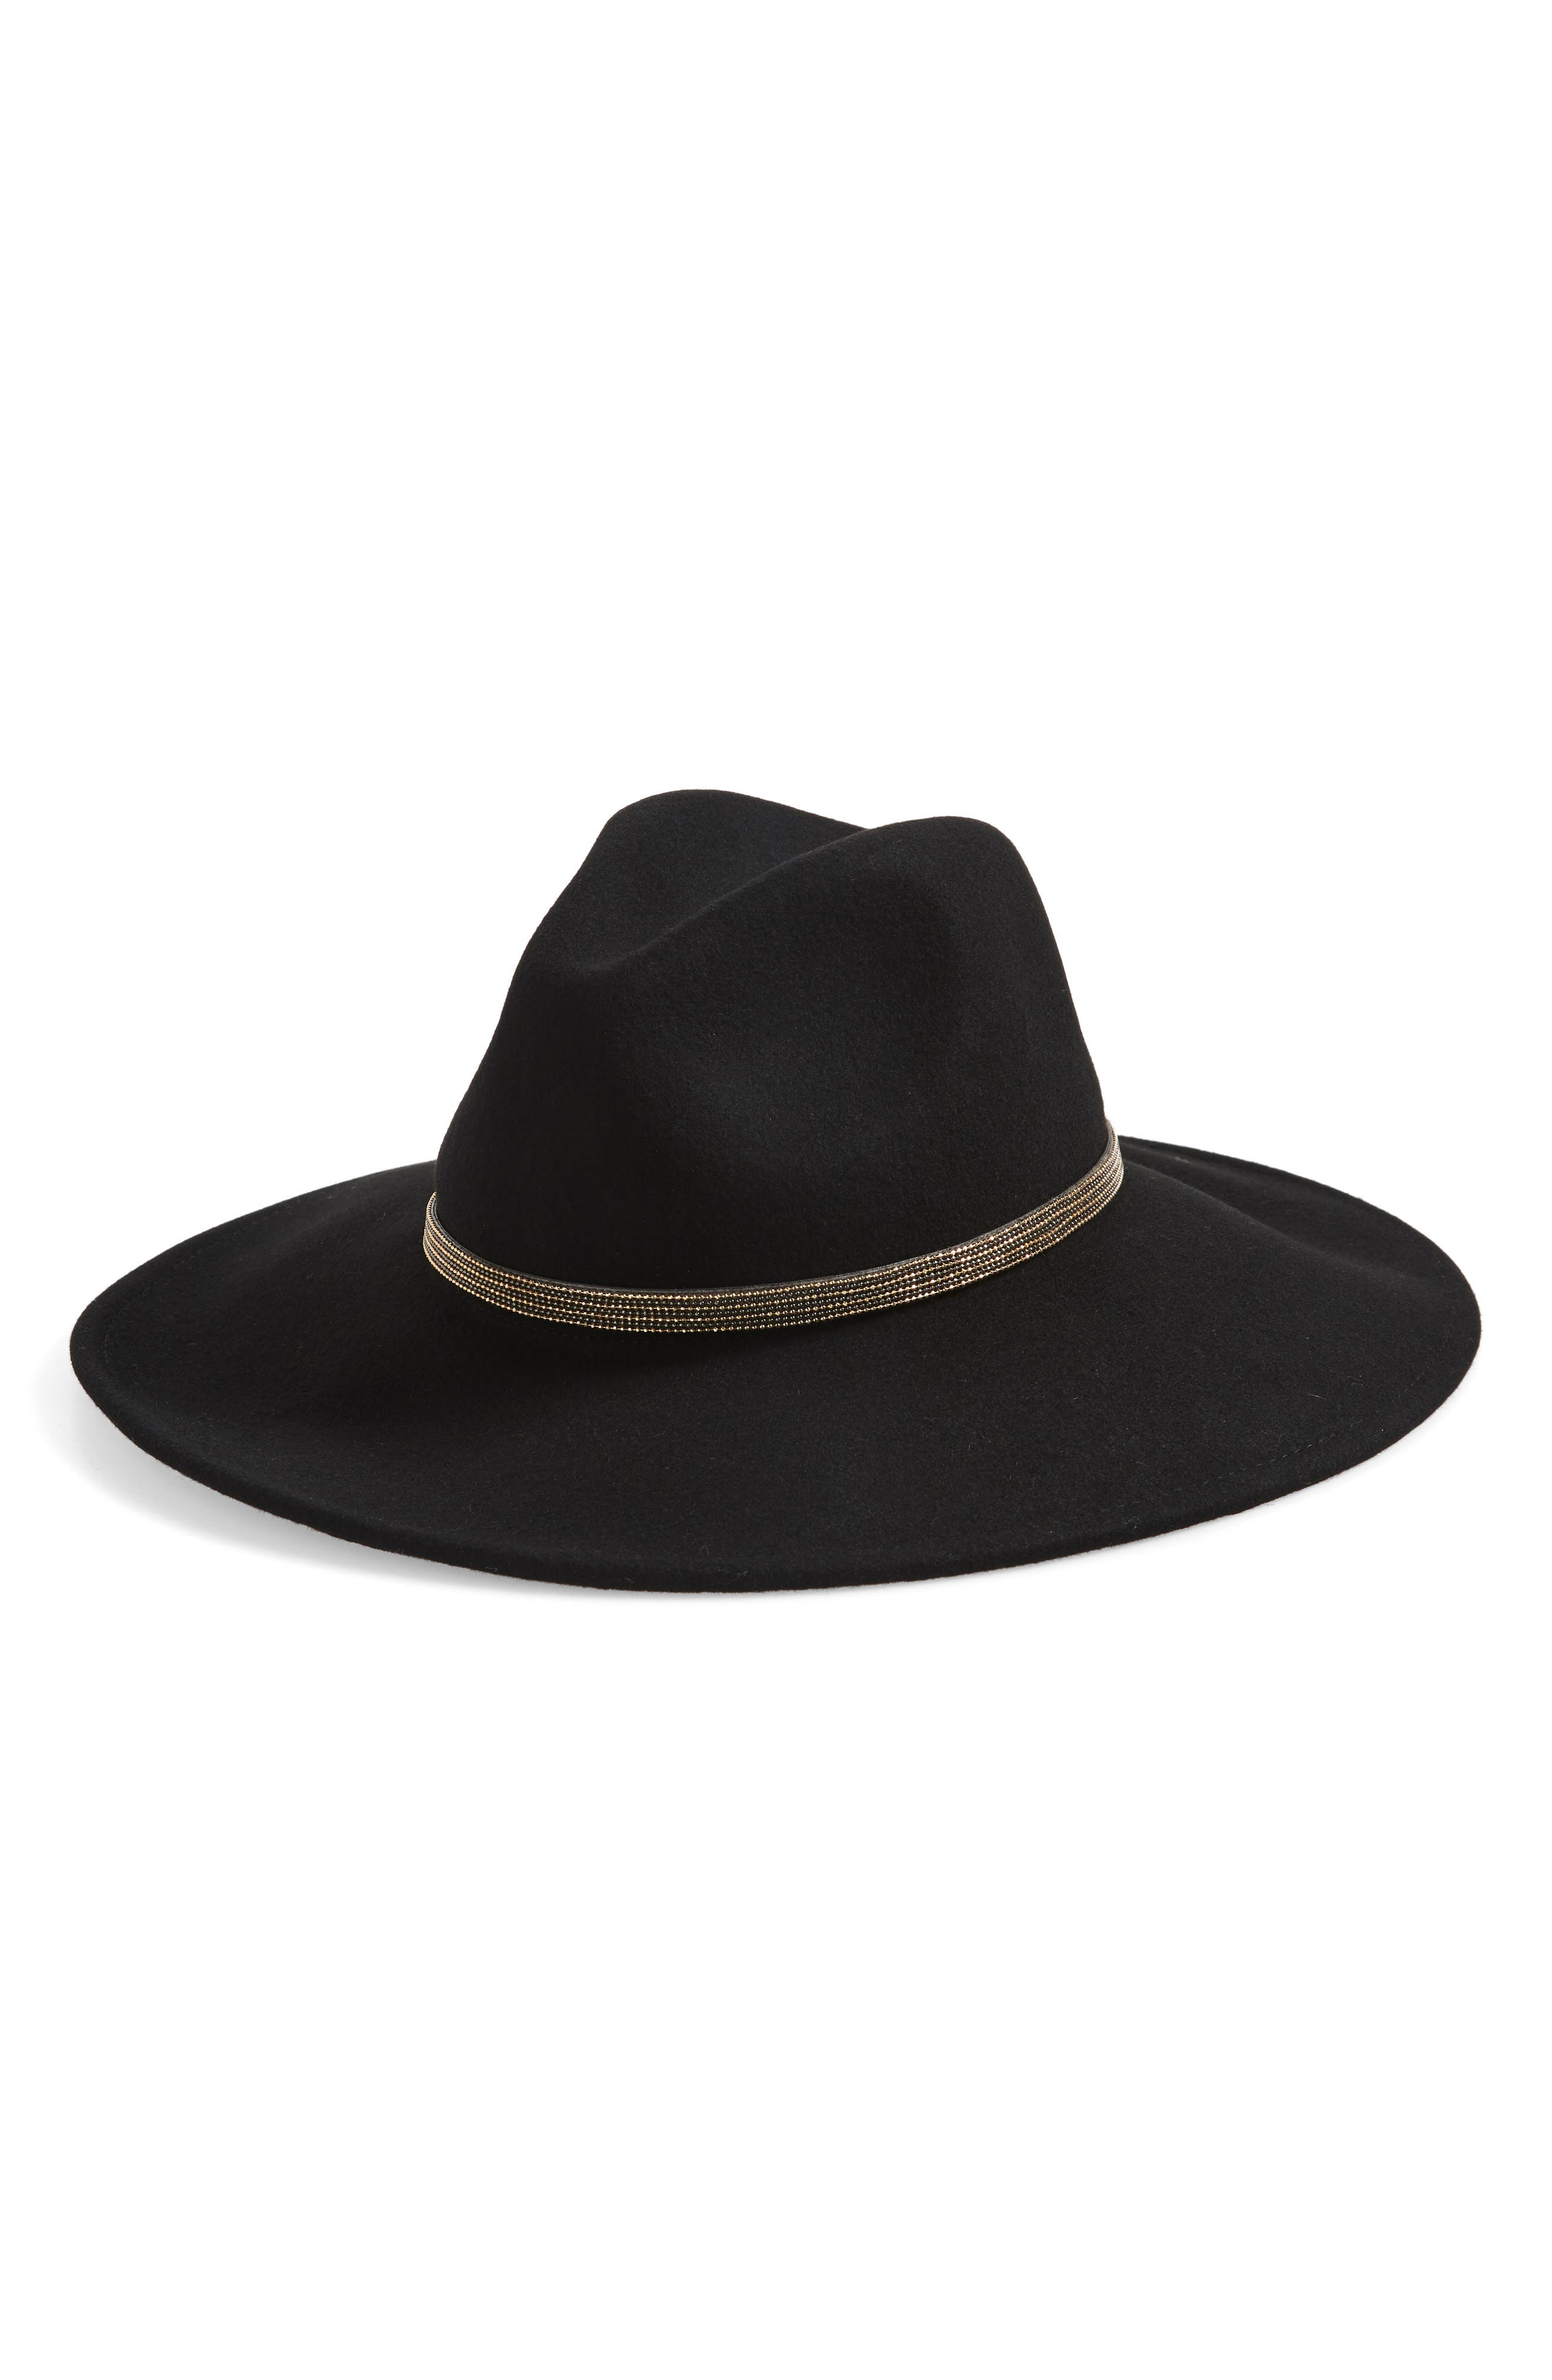 Beaded Chain Wool Felt Panama Hat,                             Main thumbnail 1, color,                             001